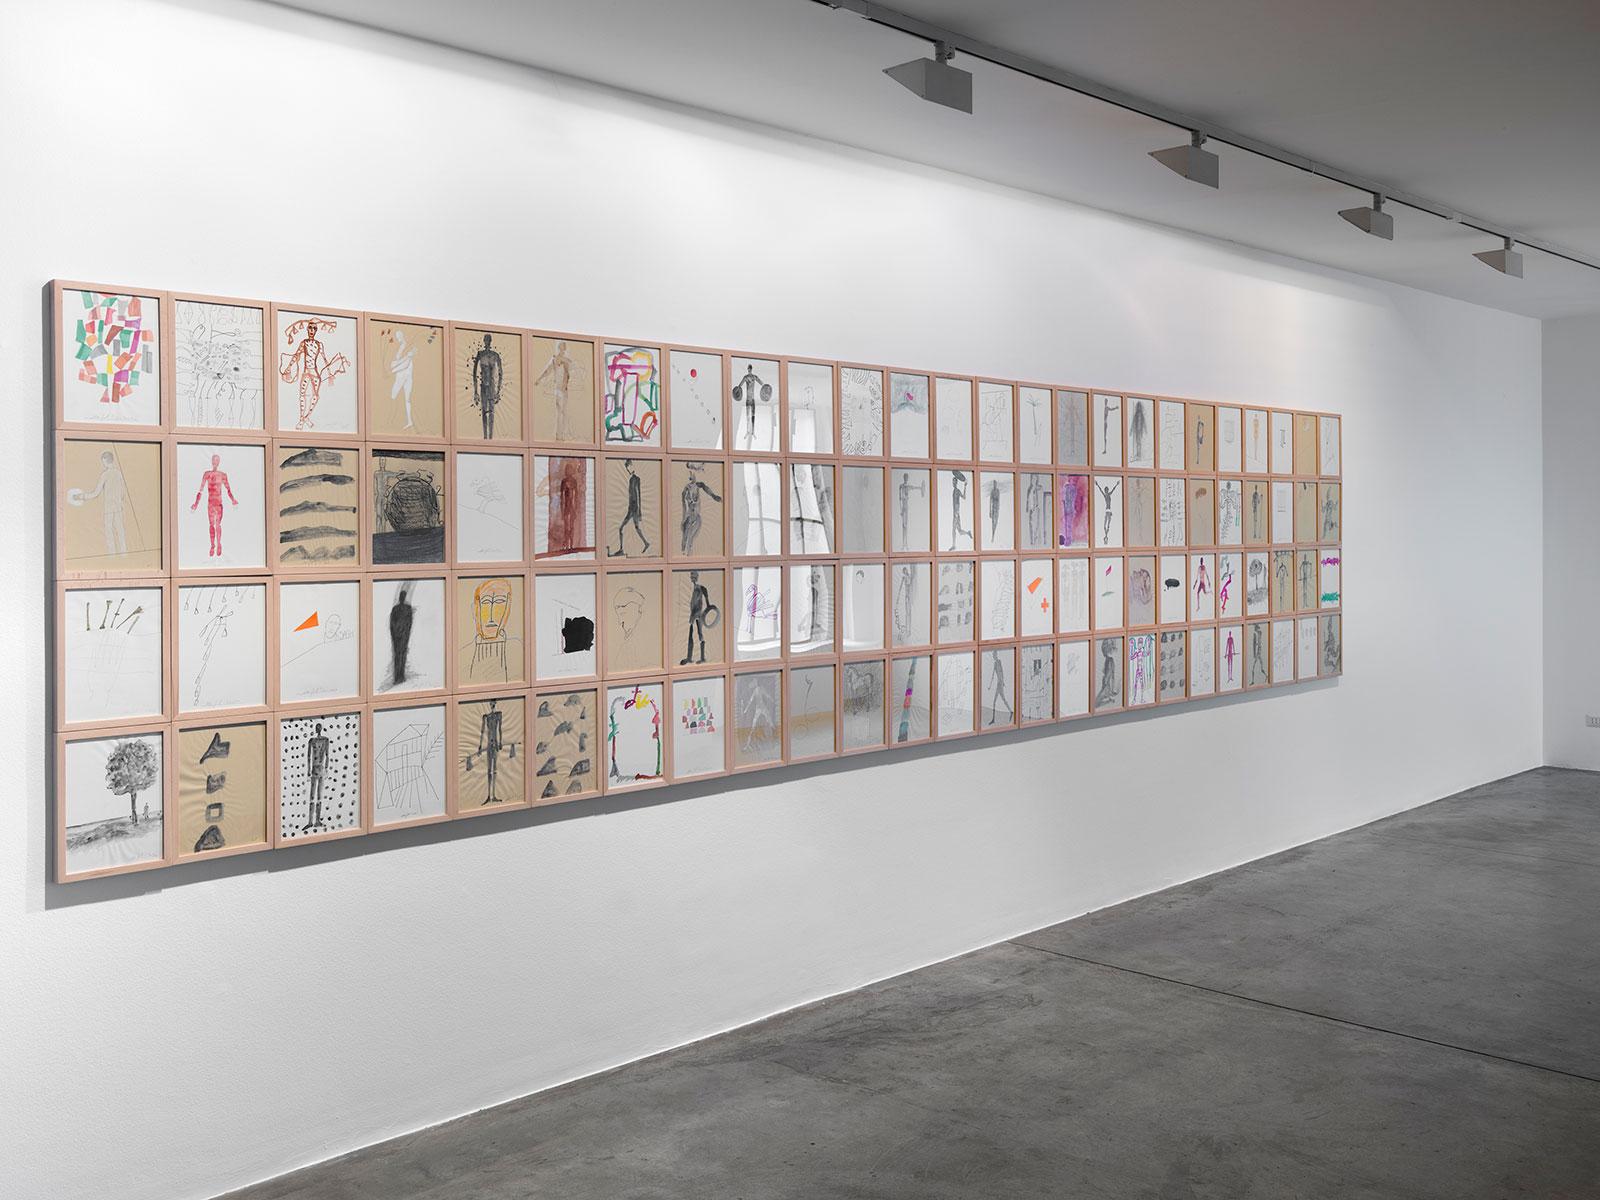 Mimmo Paladino, Installation view © 2021 Cardi Gallery. Photo Carlo Vannini